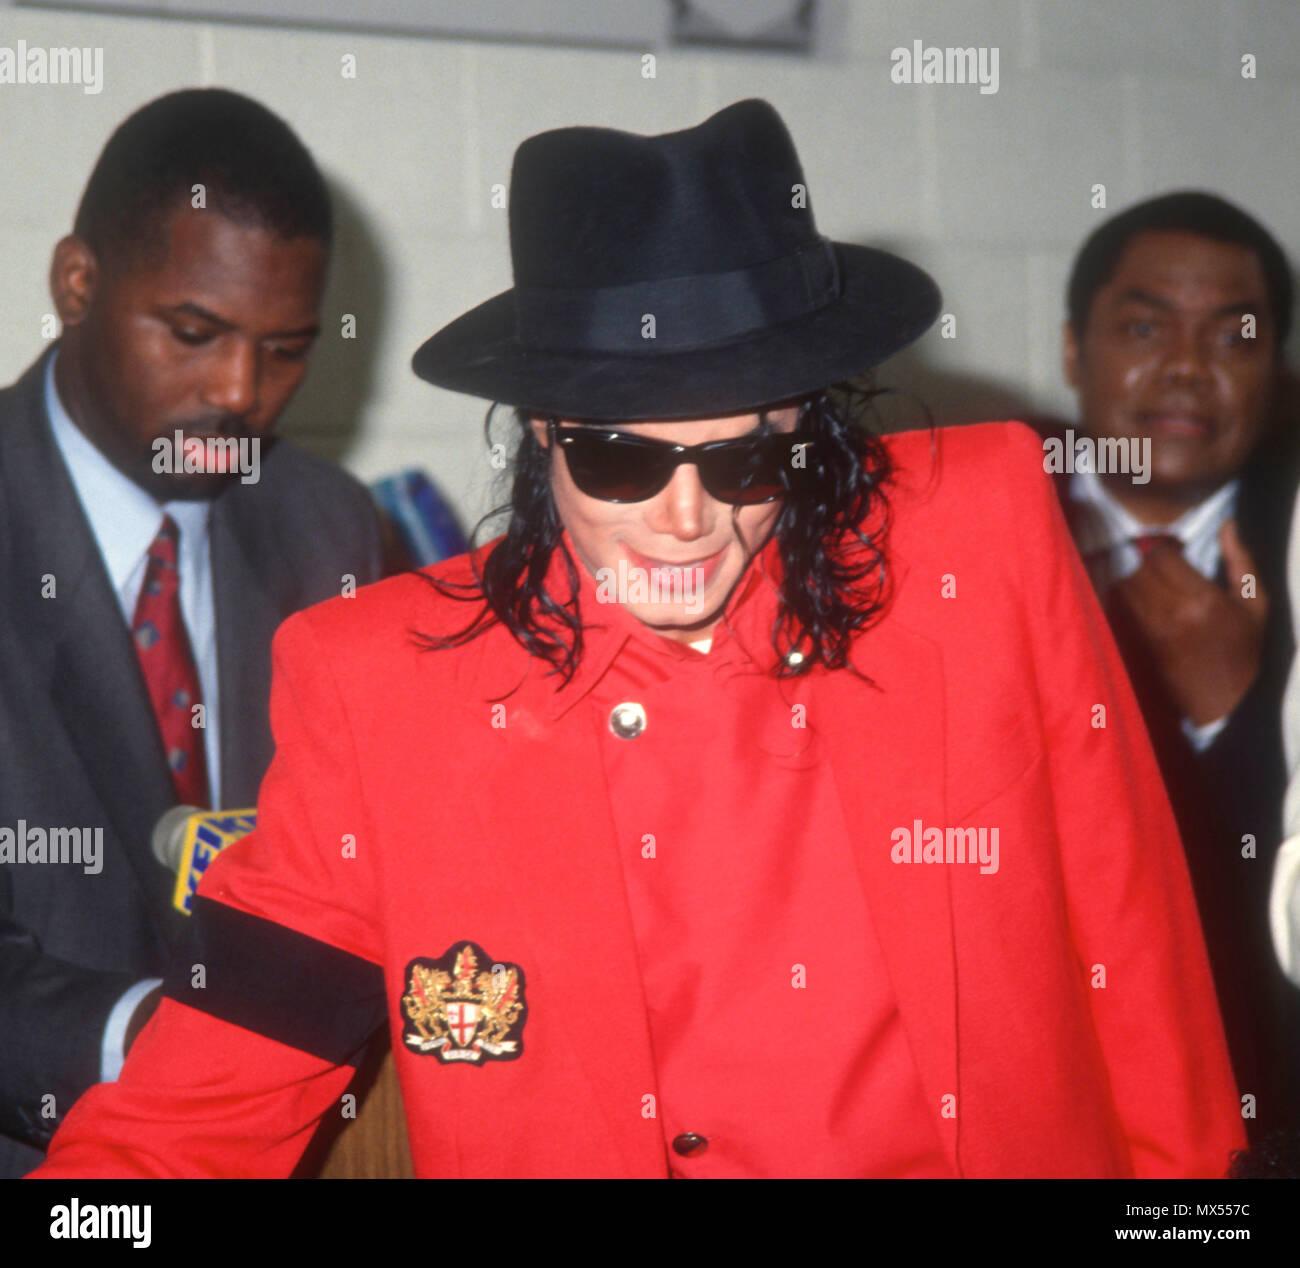 LOS ANGELES, CA - JULY 26: Singer Michael Jackson visits the